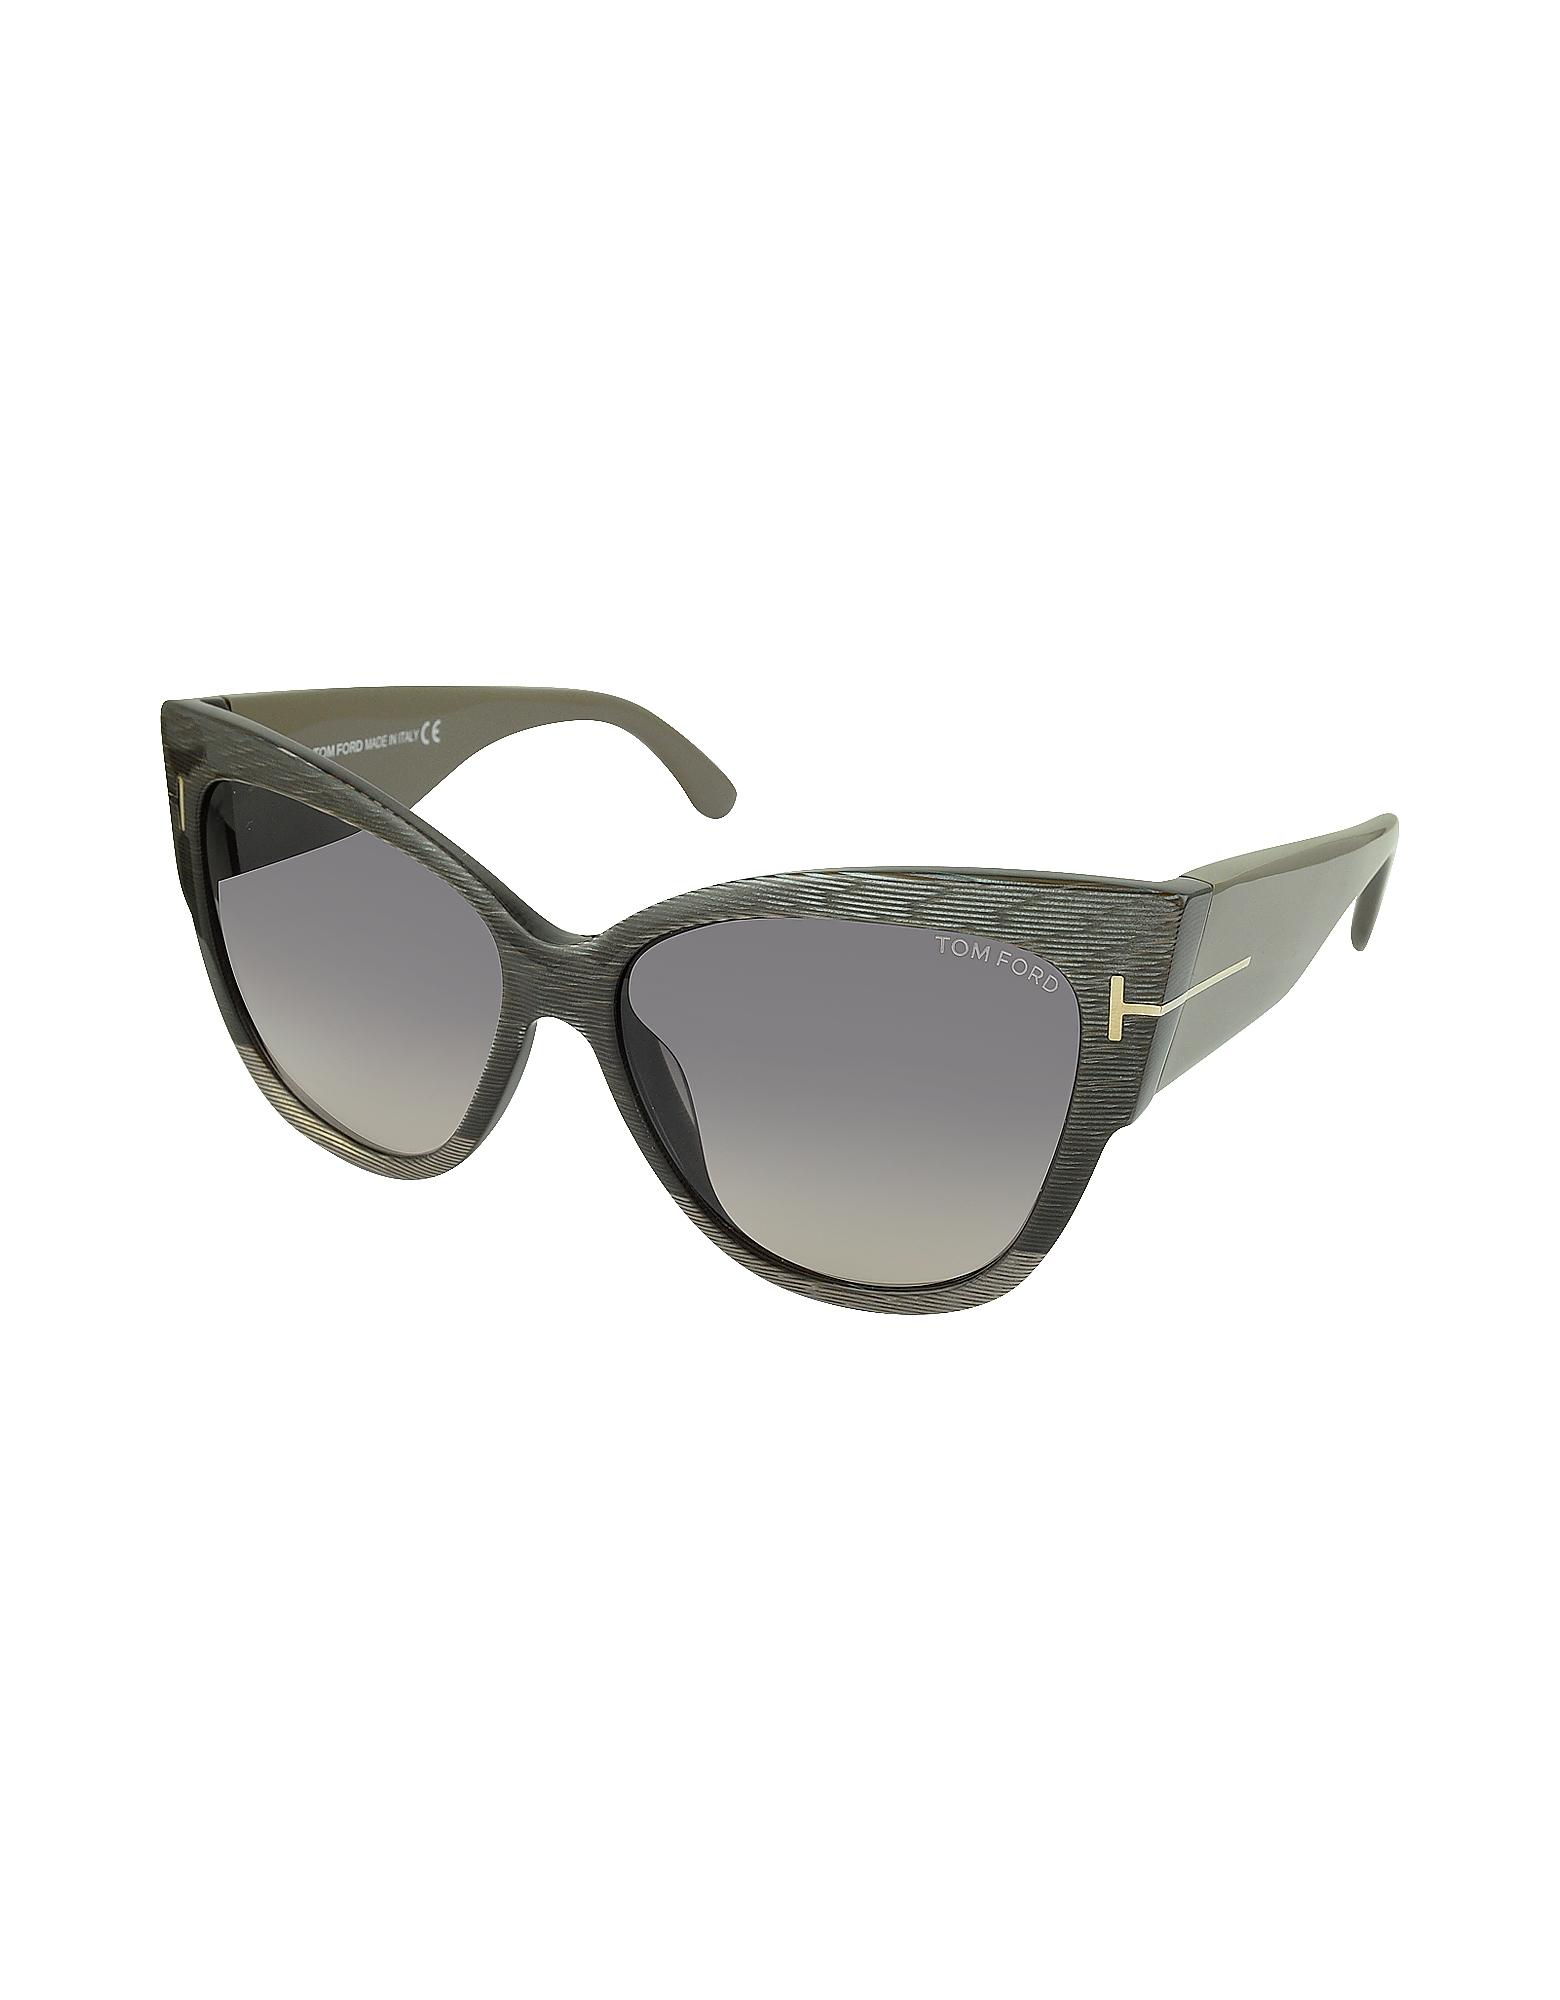 3770fc29552b Tom Ford Anoushka Ft0371 38b Dove Grey Cat Eye Sunglasses in Gray - Lyst